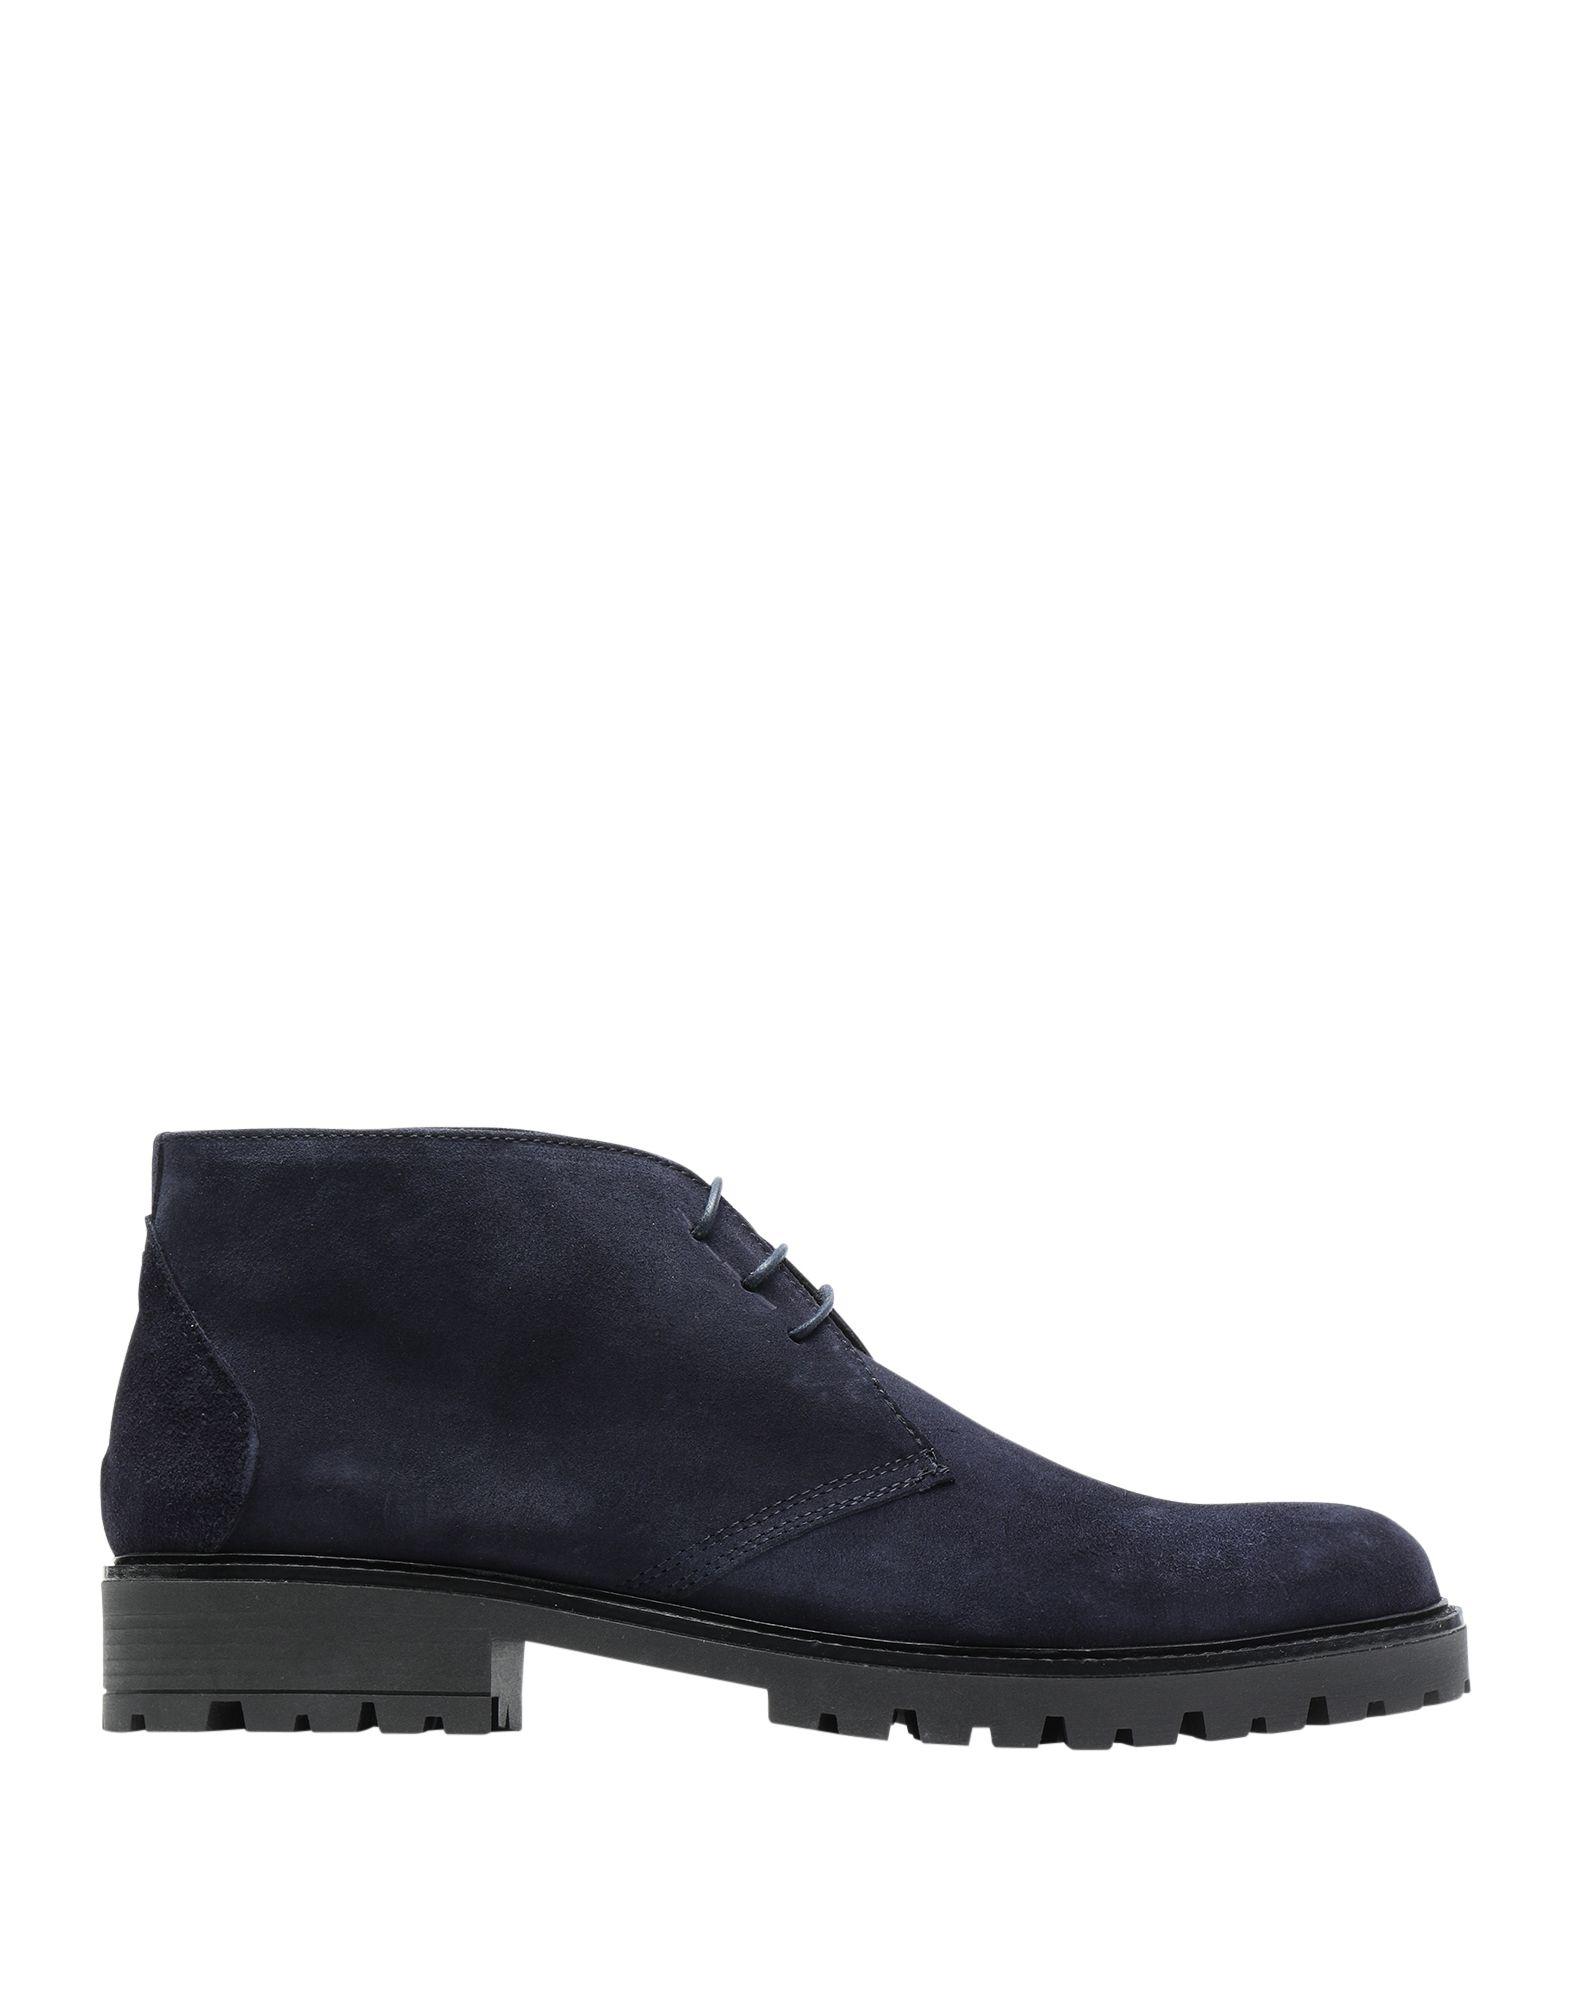 8 by YOOX Полусапоги и высокие ботинки shy by arvid yuki полусапоги и высокие ботинки